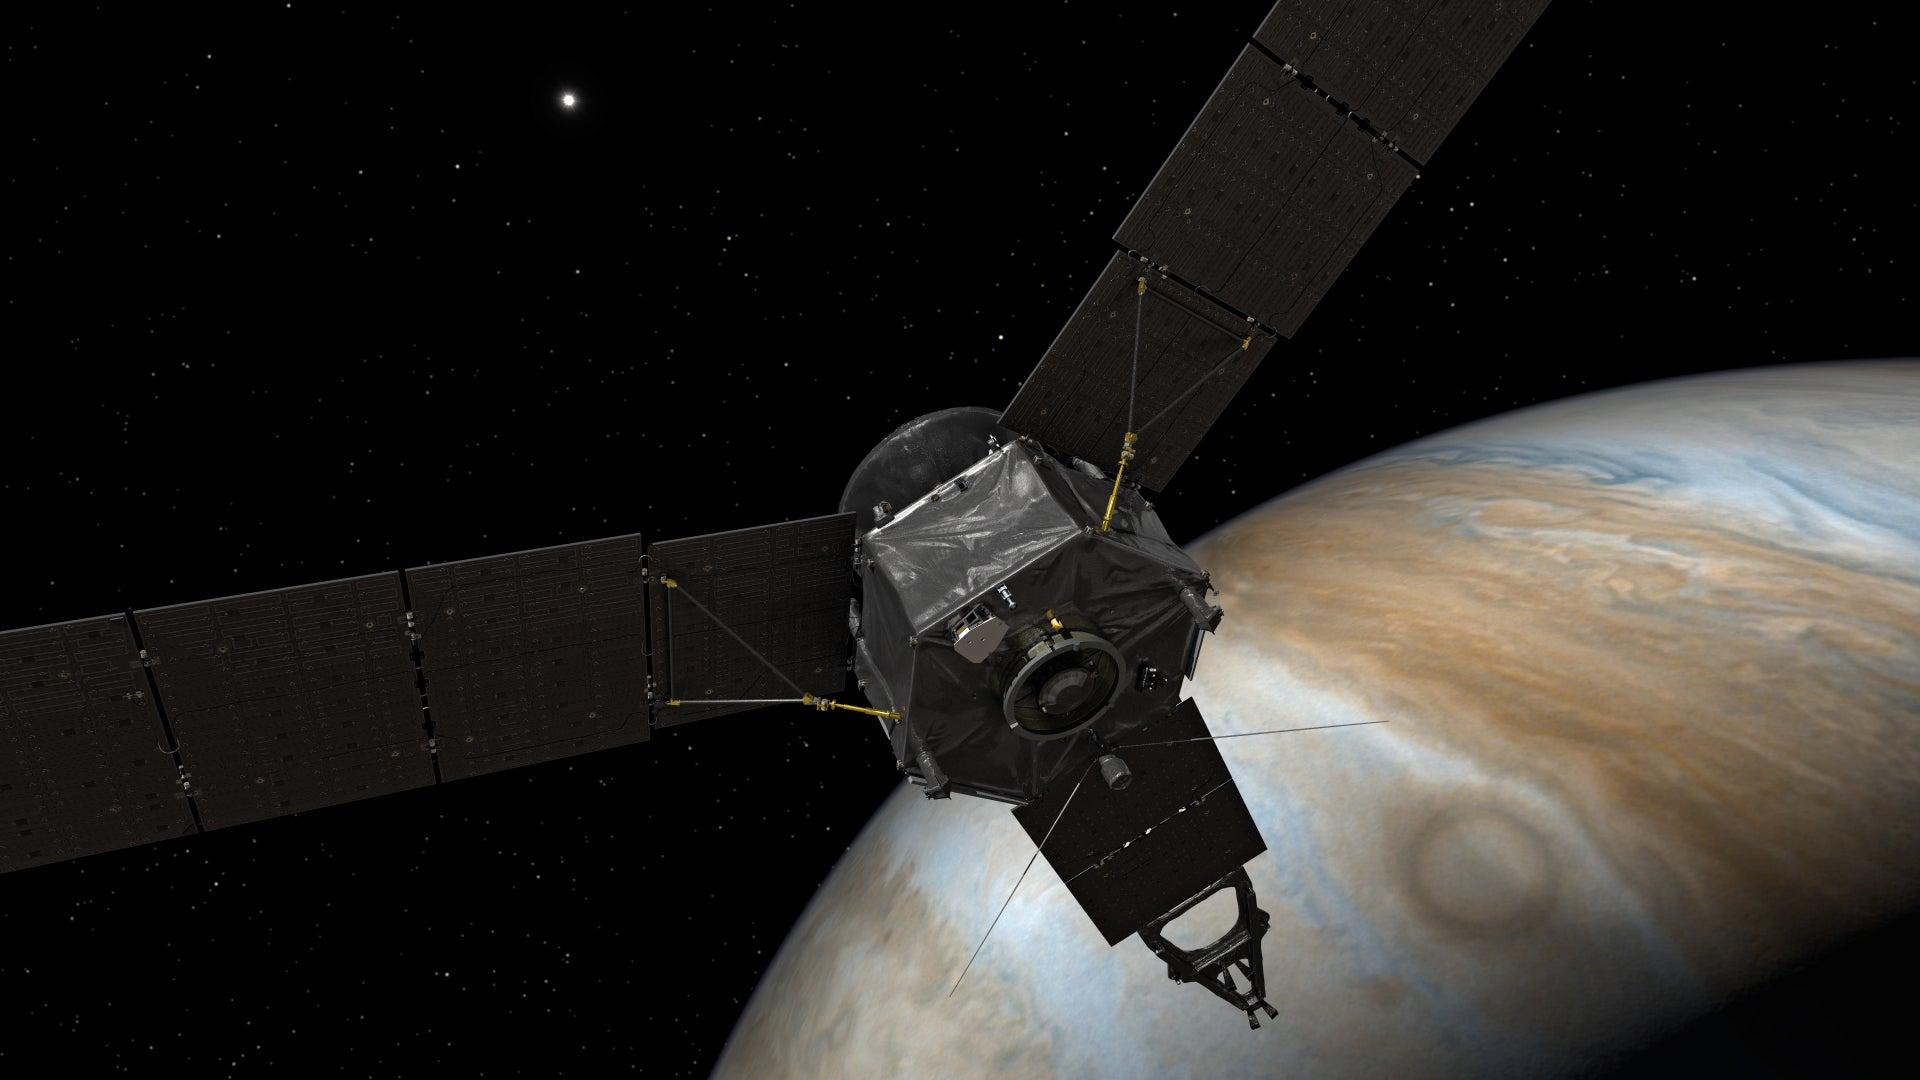 NASA's Juno spacecraft prepares for cosmic date with Jupiter